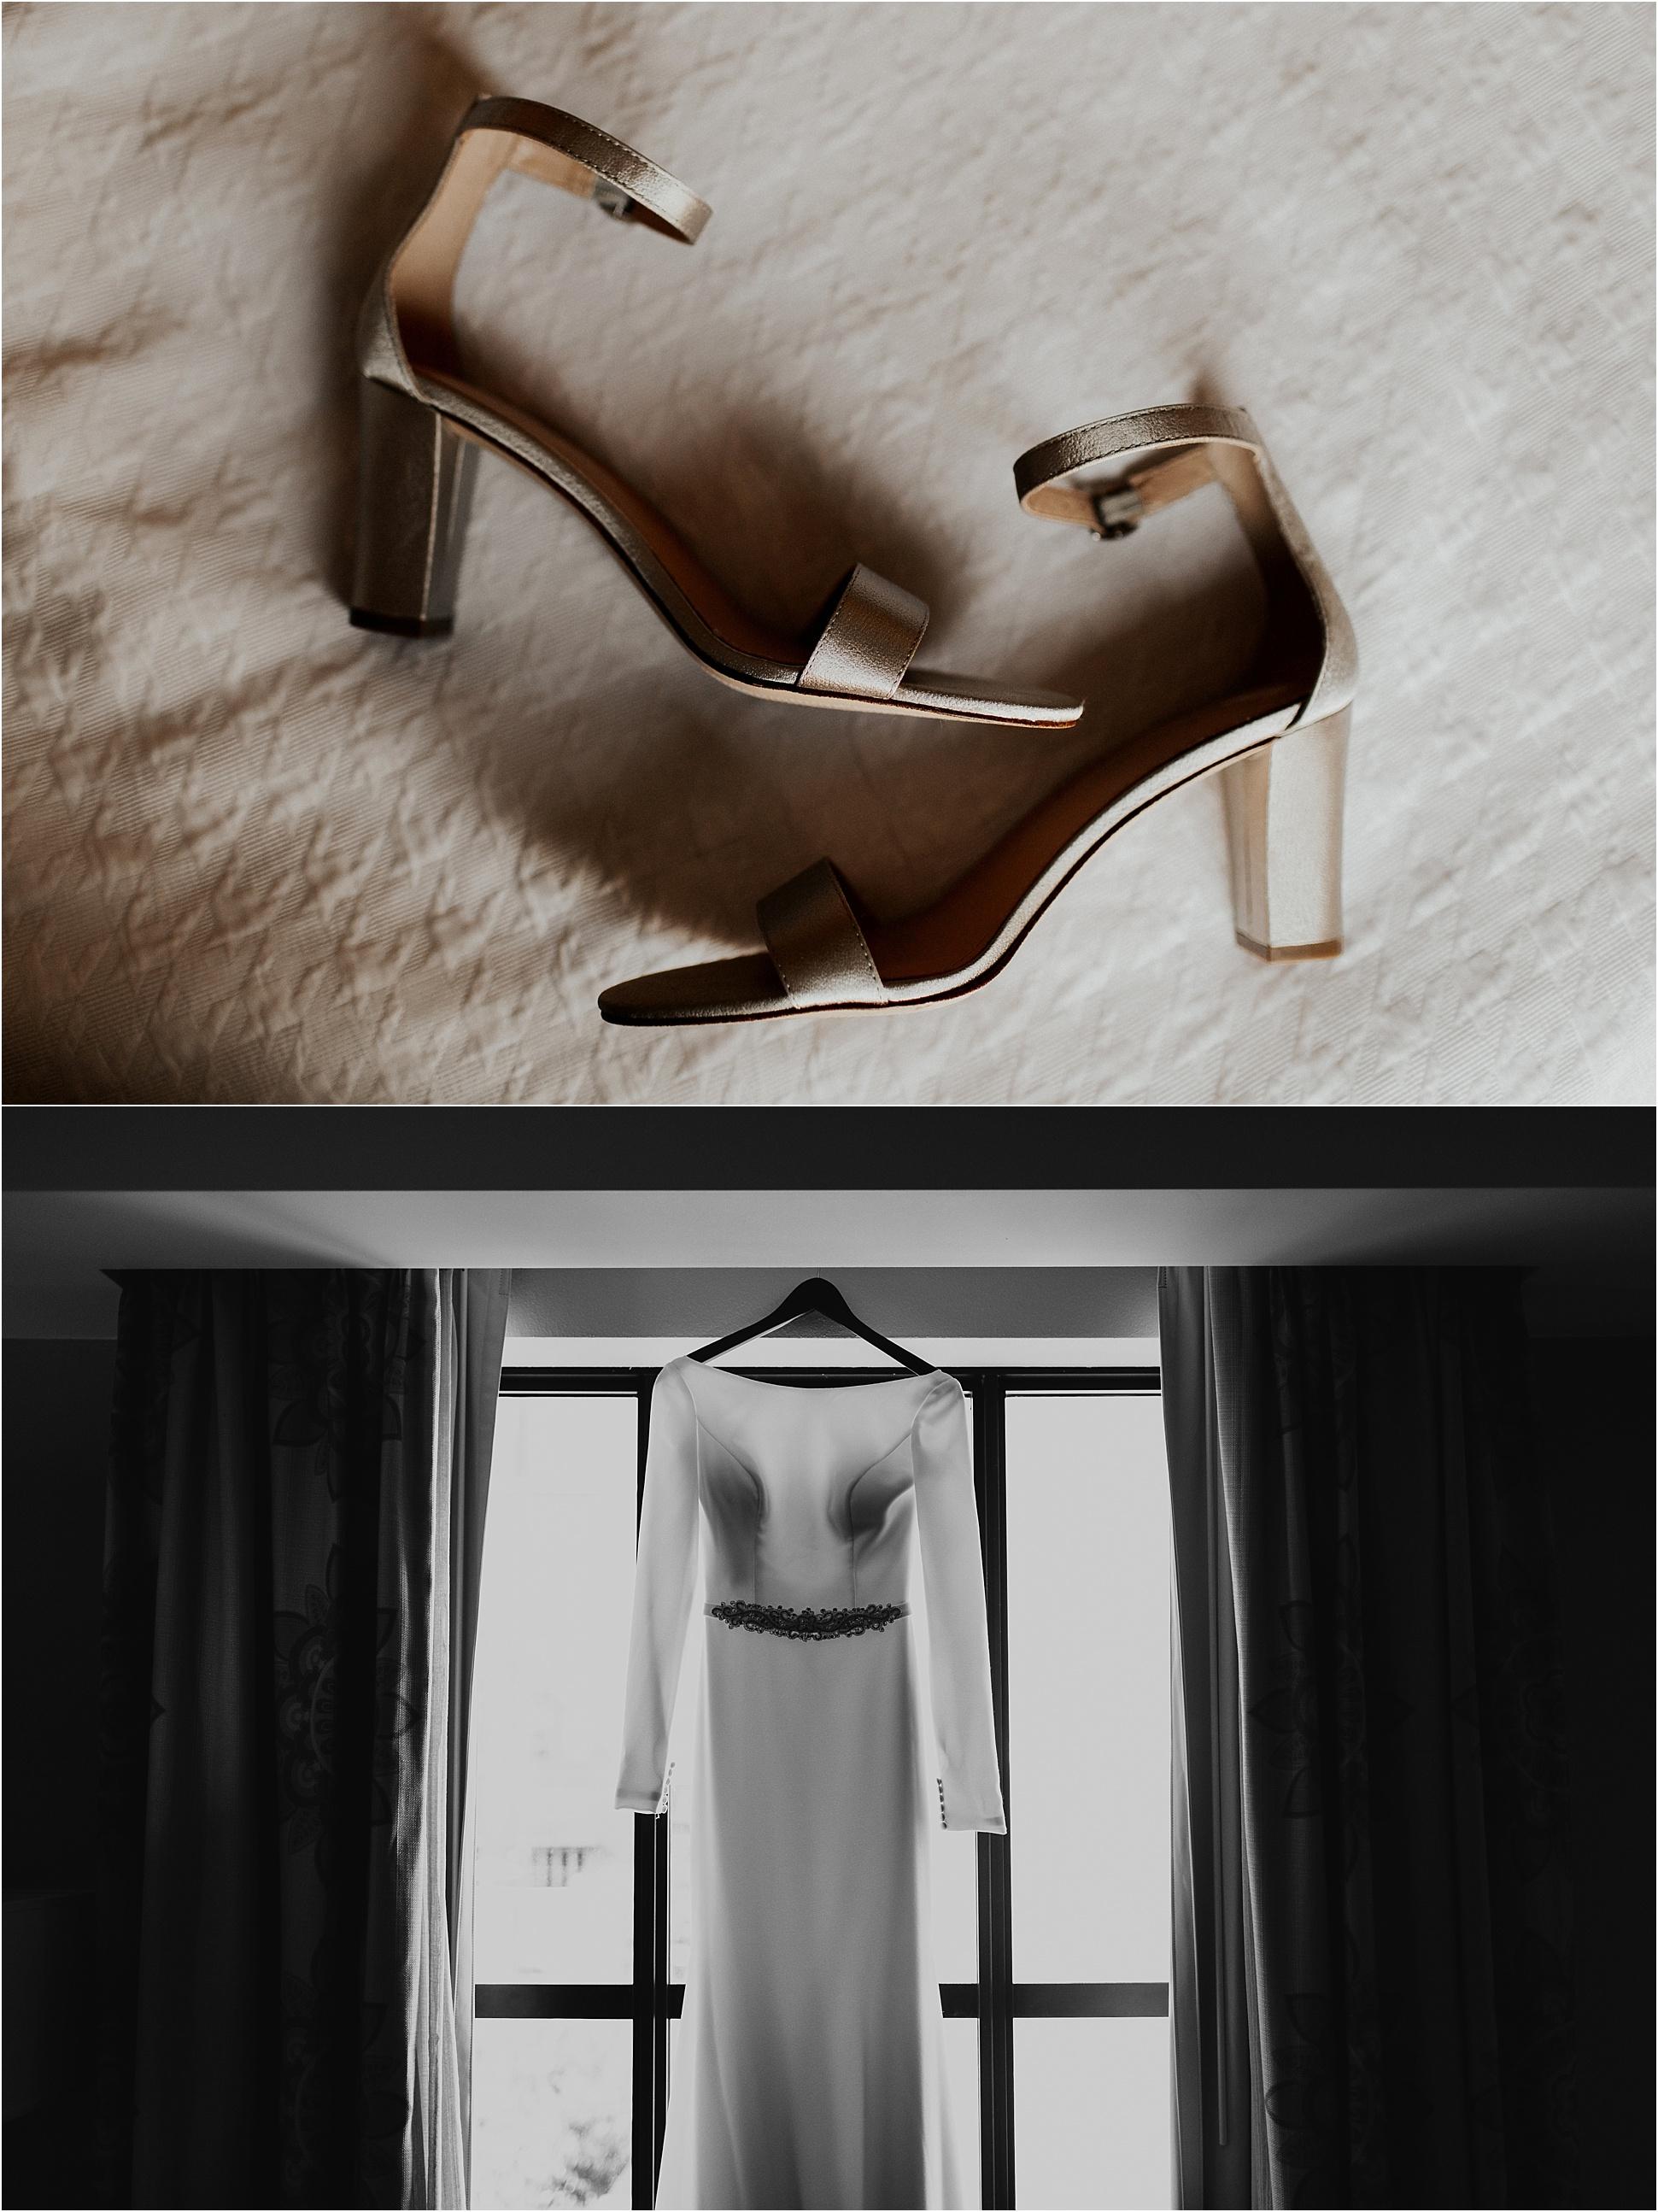 upstairs_midtown_intimate_charleston_wedding002.JPG